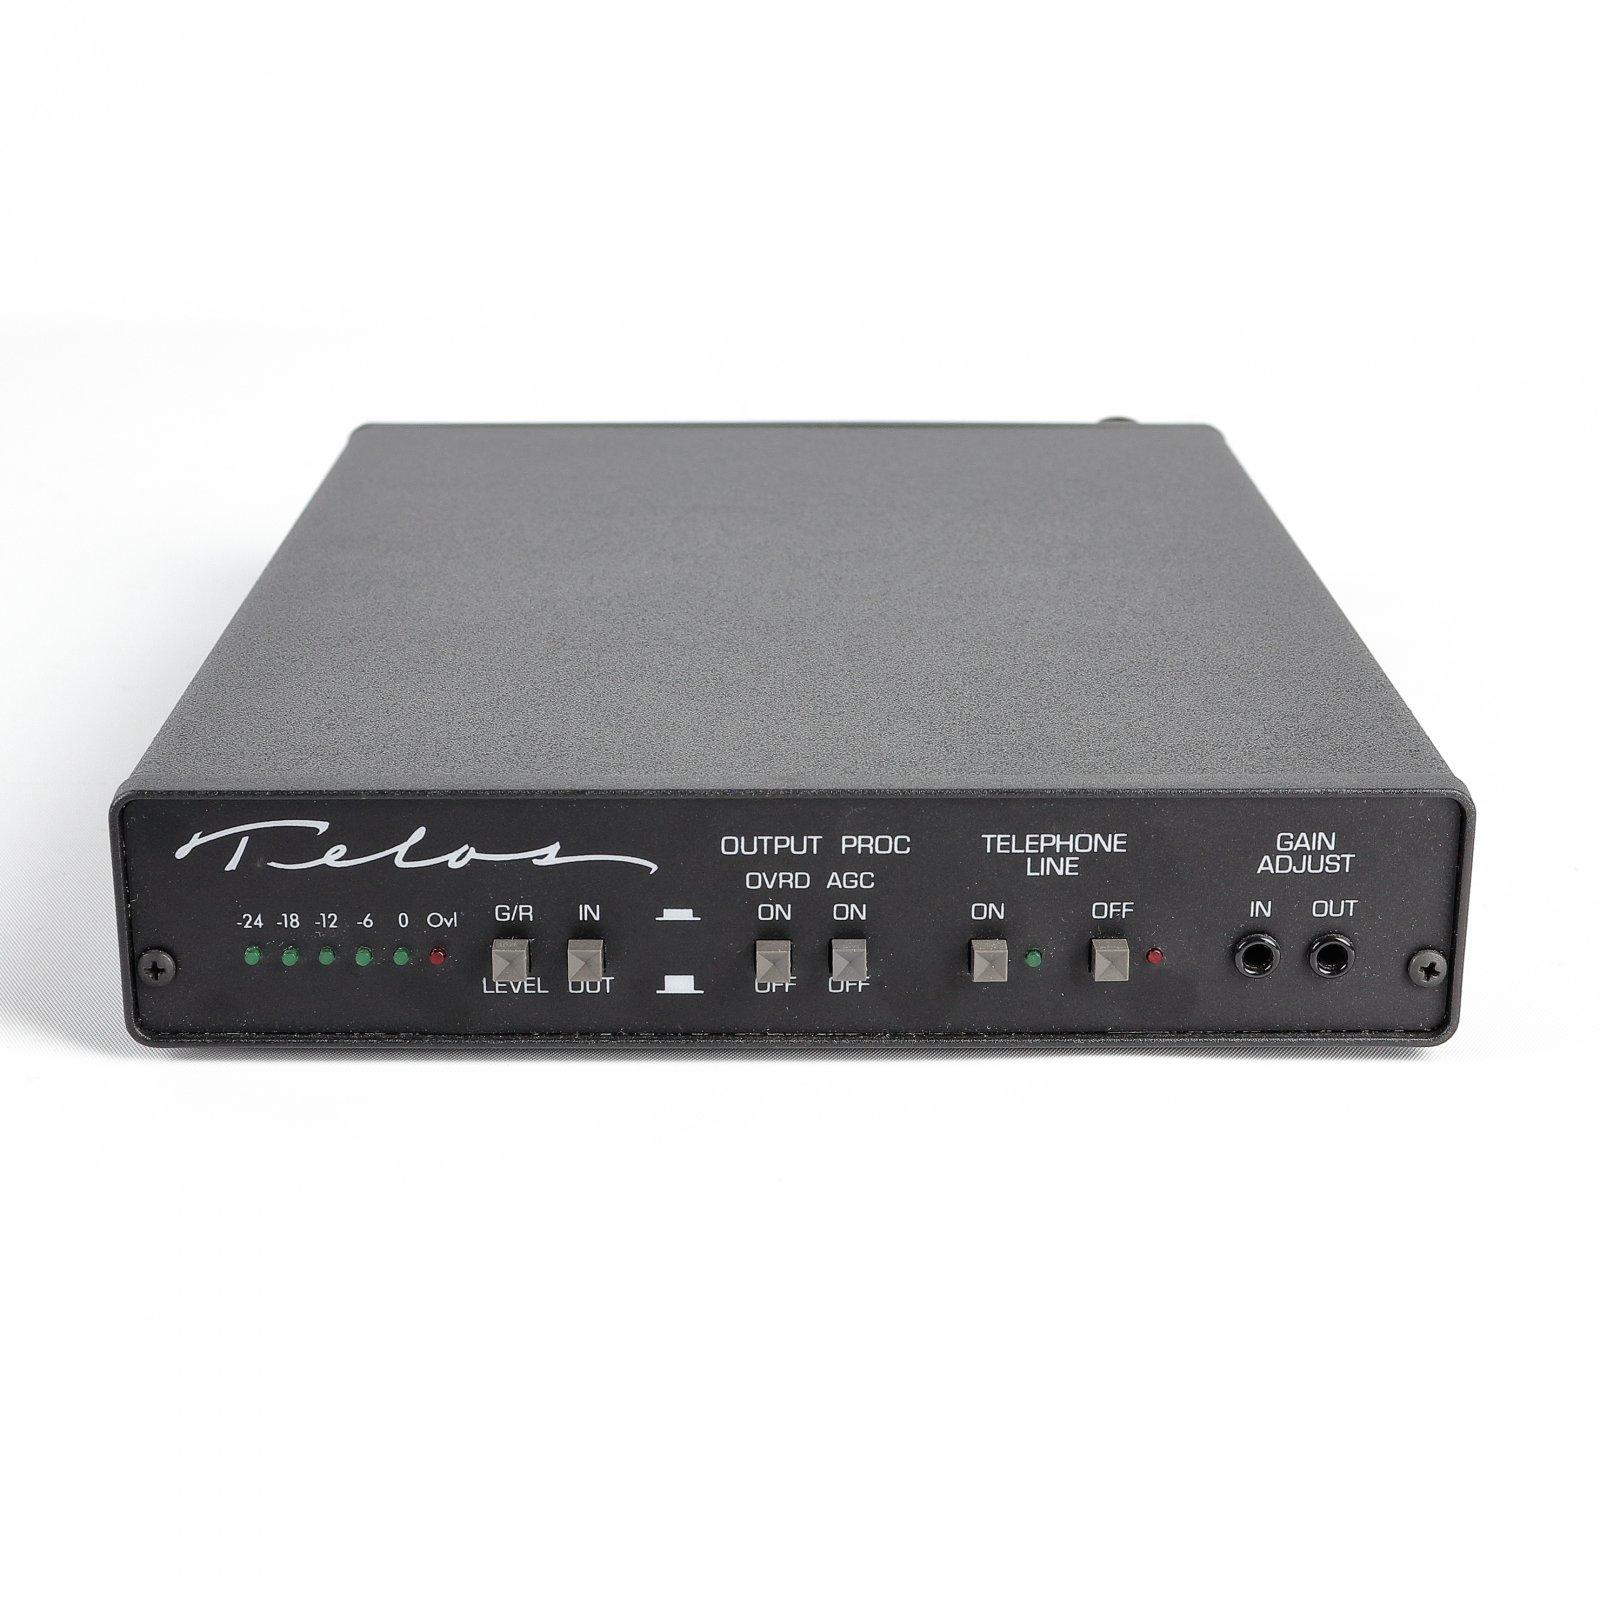 Telos ONE Digital Hybrid Telephone Interface, Modem Case Version (USED)